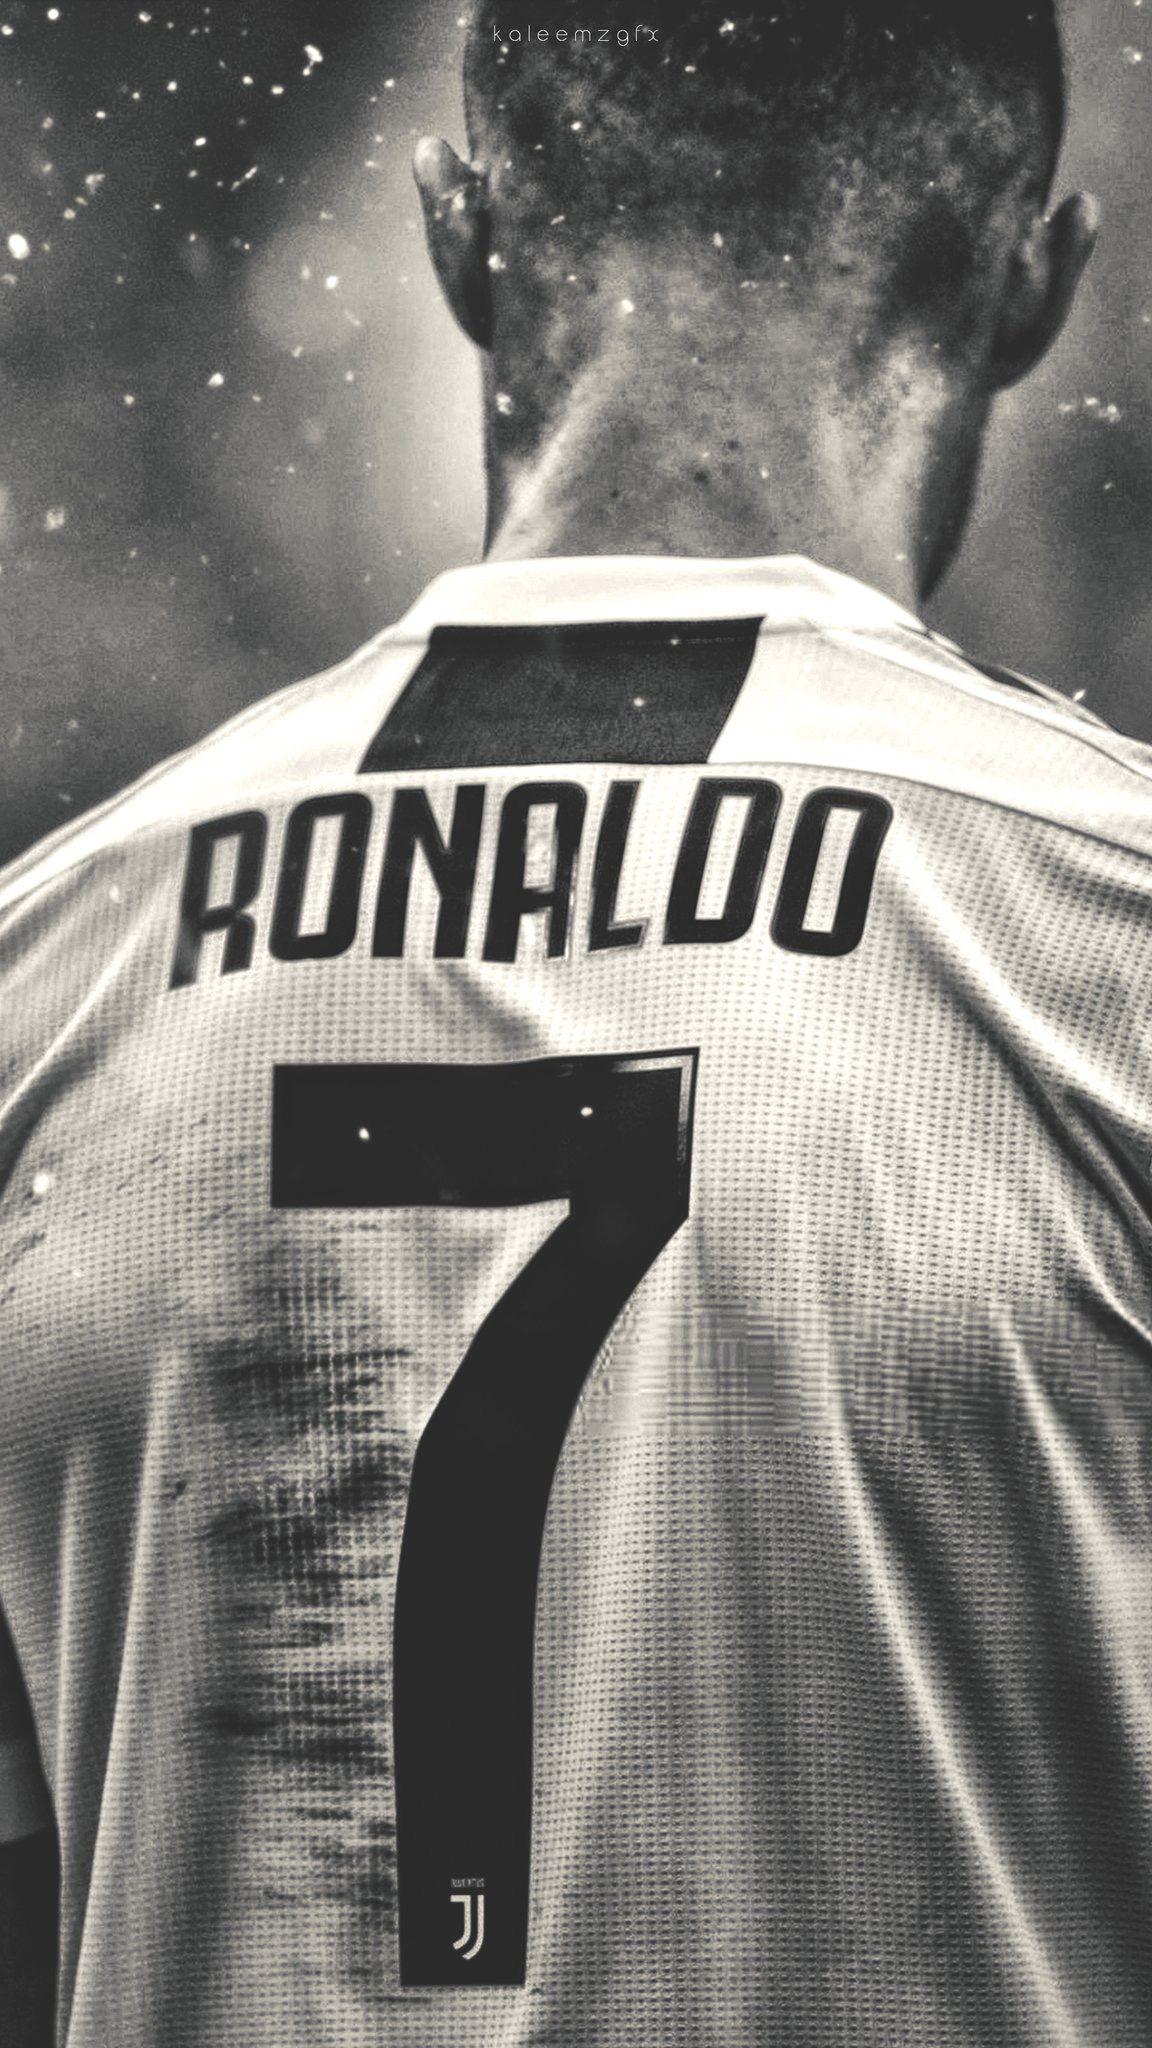 Cristiano Ronaldo Juventus , HD Wallpaper & Backgrounds